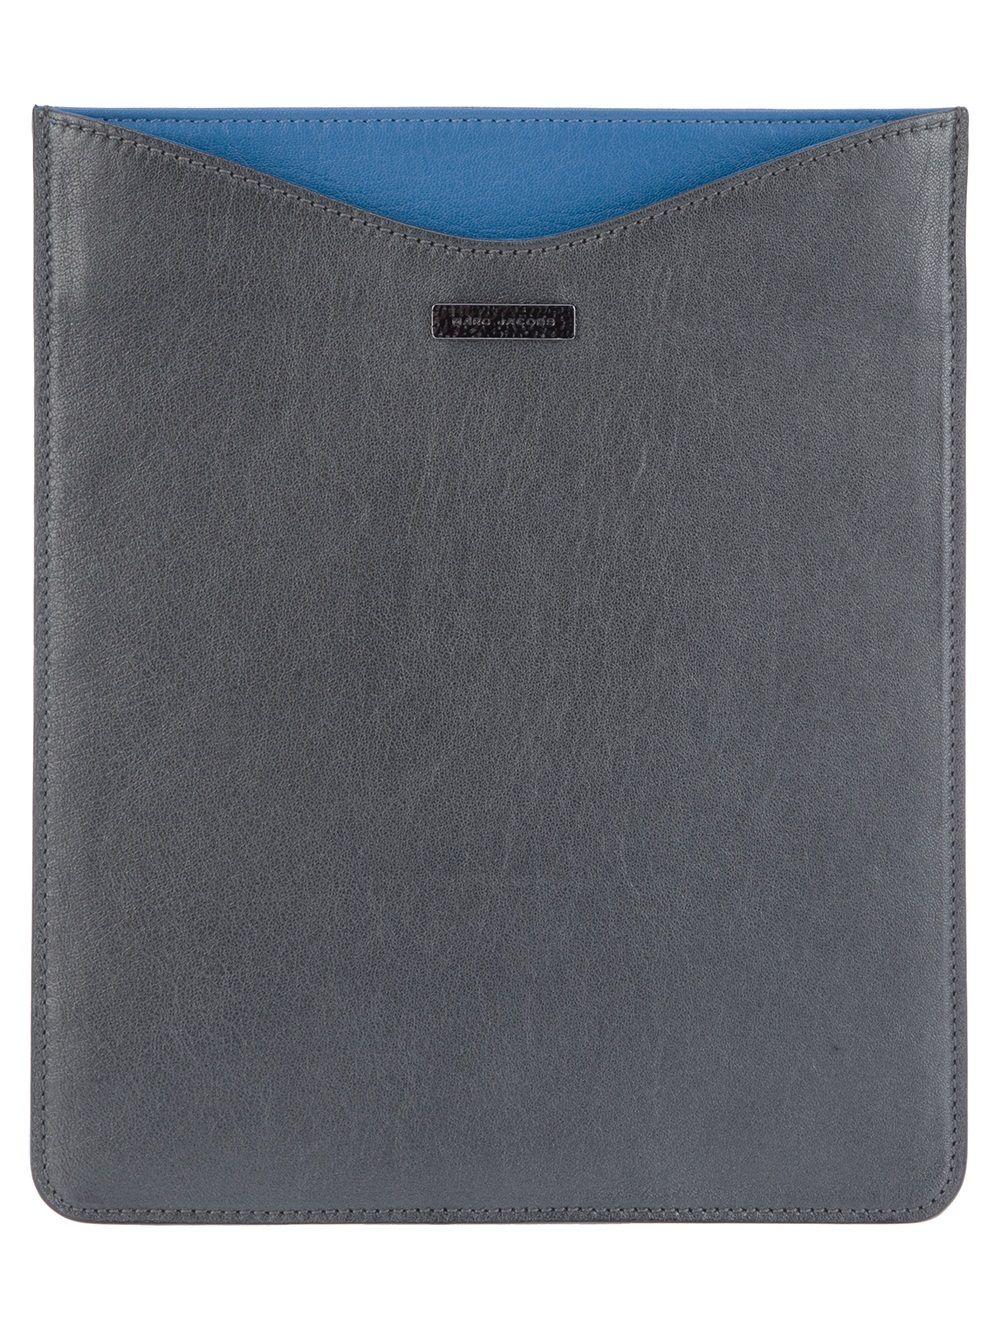 marc jacobs ipad case lookbook pinterest ipad case designer